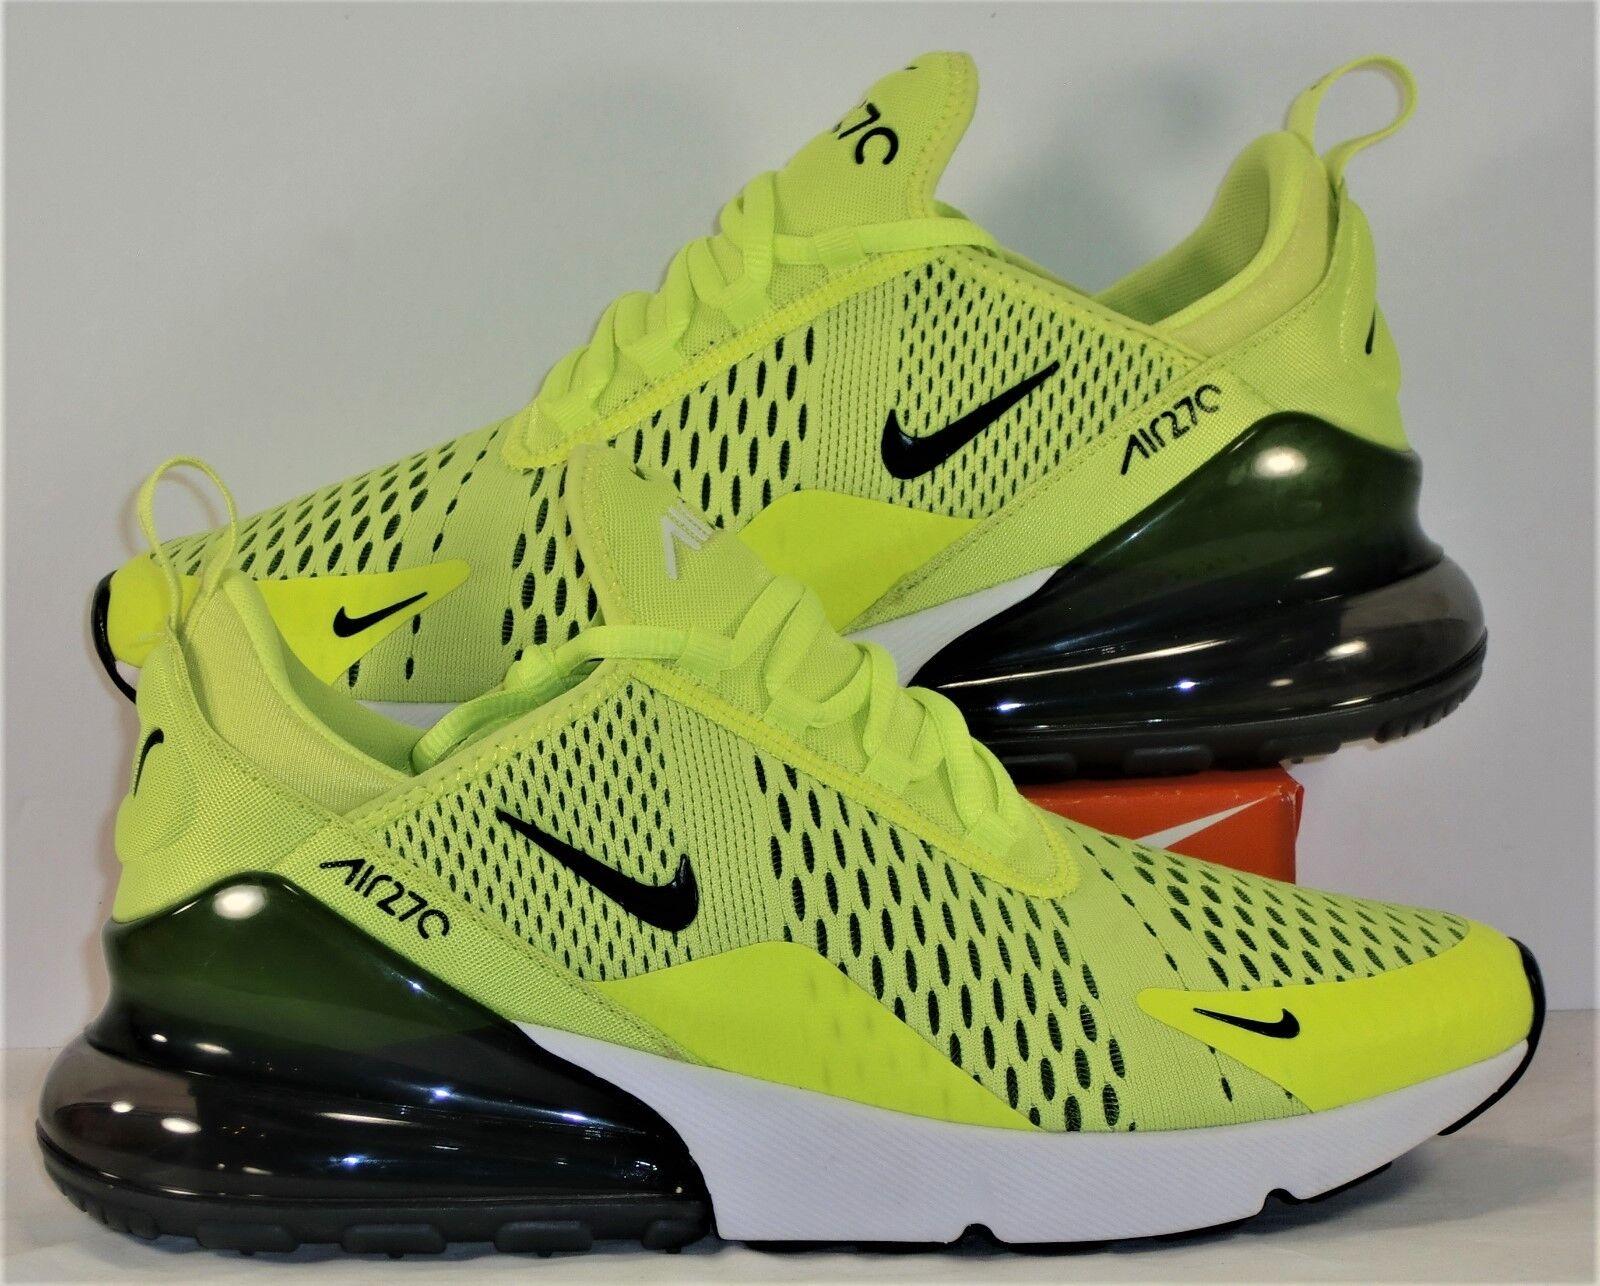 Nike Air Max 270 Black & Volt & White Mens Running shoes Sz 9 NEW AH8050 701